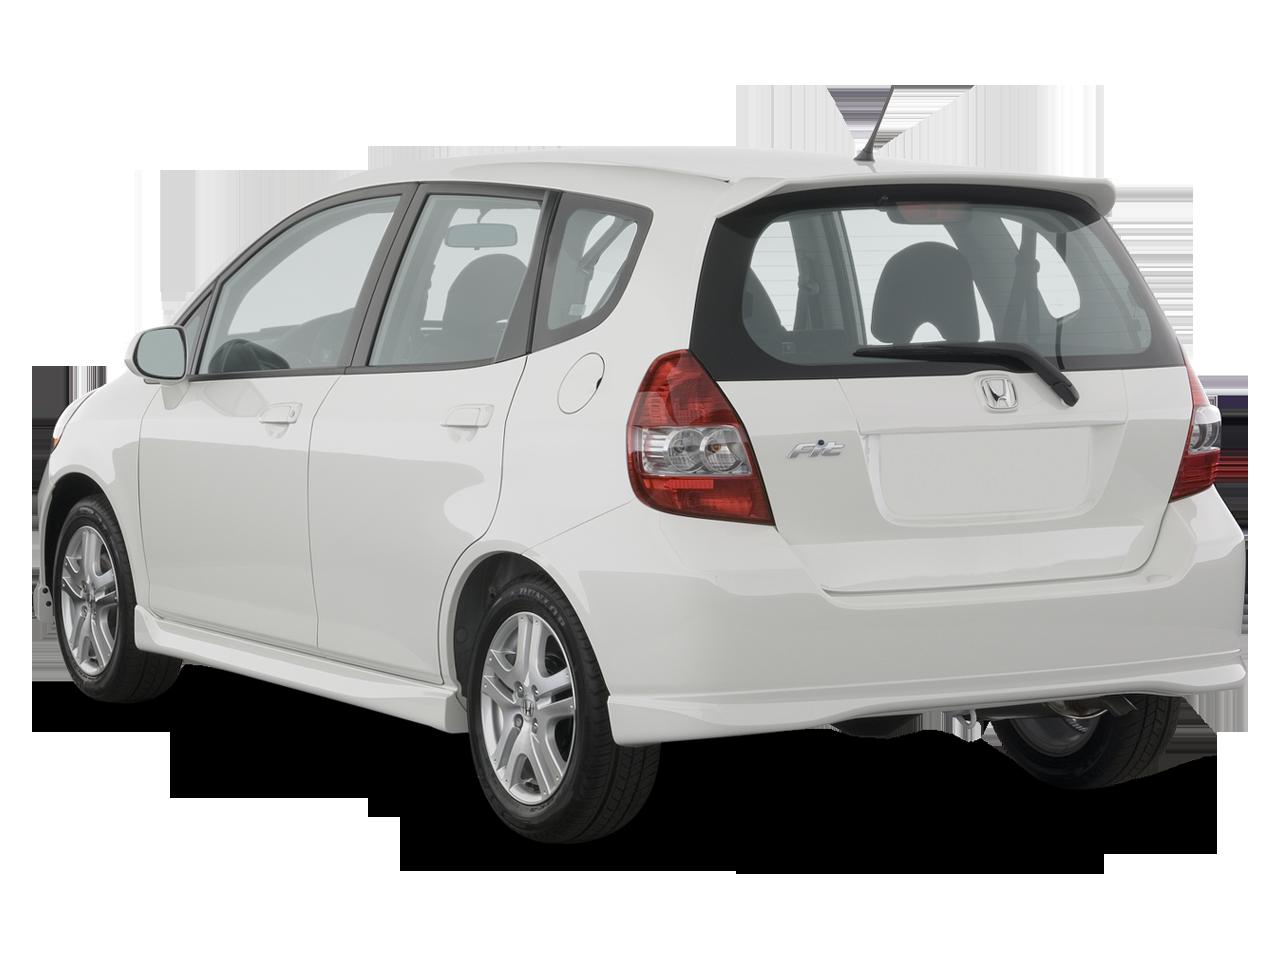 Honda Fit Mpg >> 2008 Honda Fit Sport - Honda Subcompact Hatchback Review - Automobile Magazine